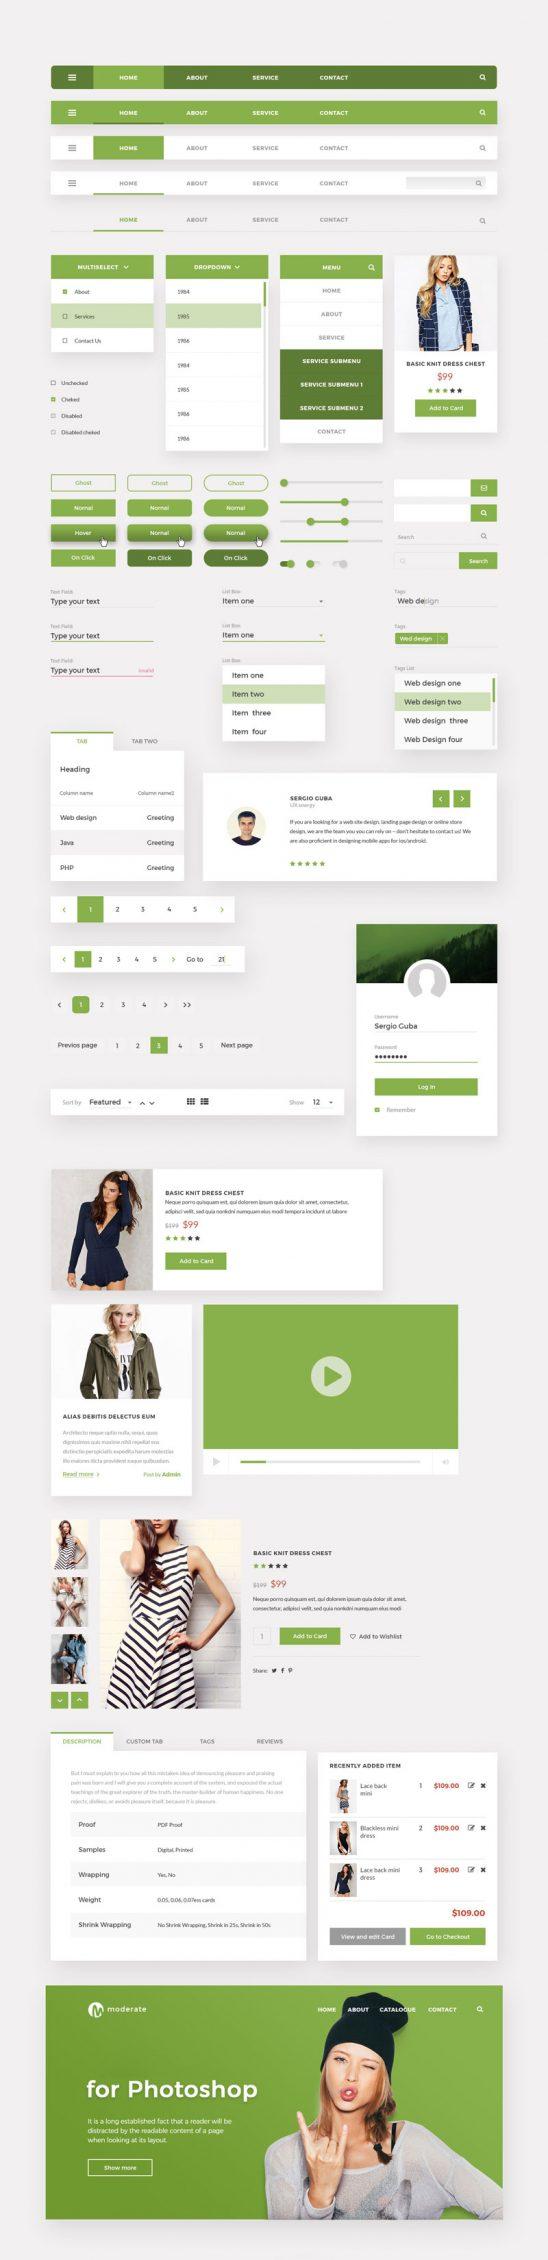 p536 548x2260 - طرح آماده گرافیک اپلیکیشن فروشگاهی بصورت لایه باز به رنگ سبز / اینترفیس UX و UI موبایل اندورید و ios با صفحات کاربردی و متنوع